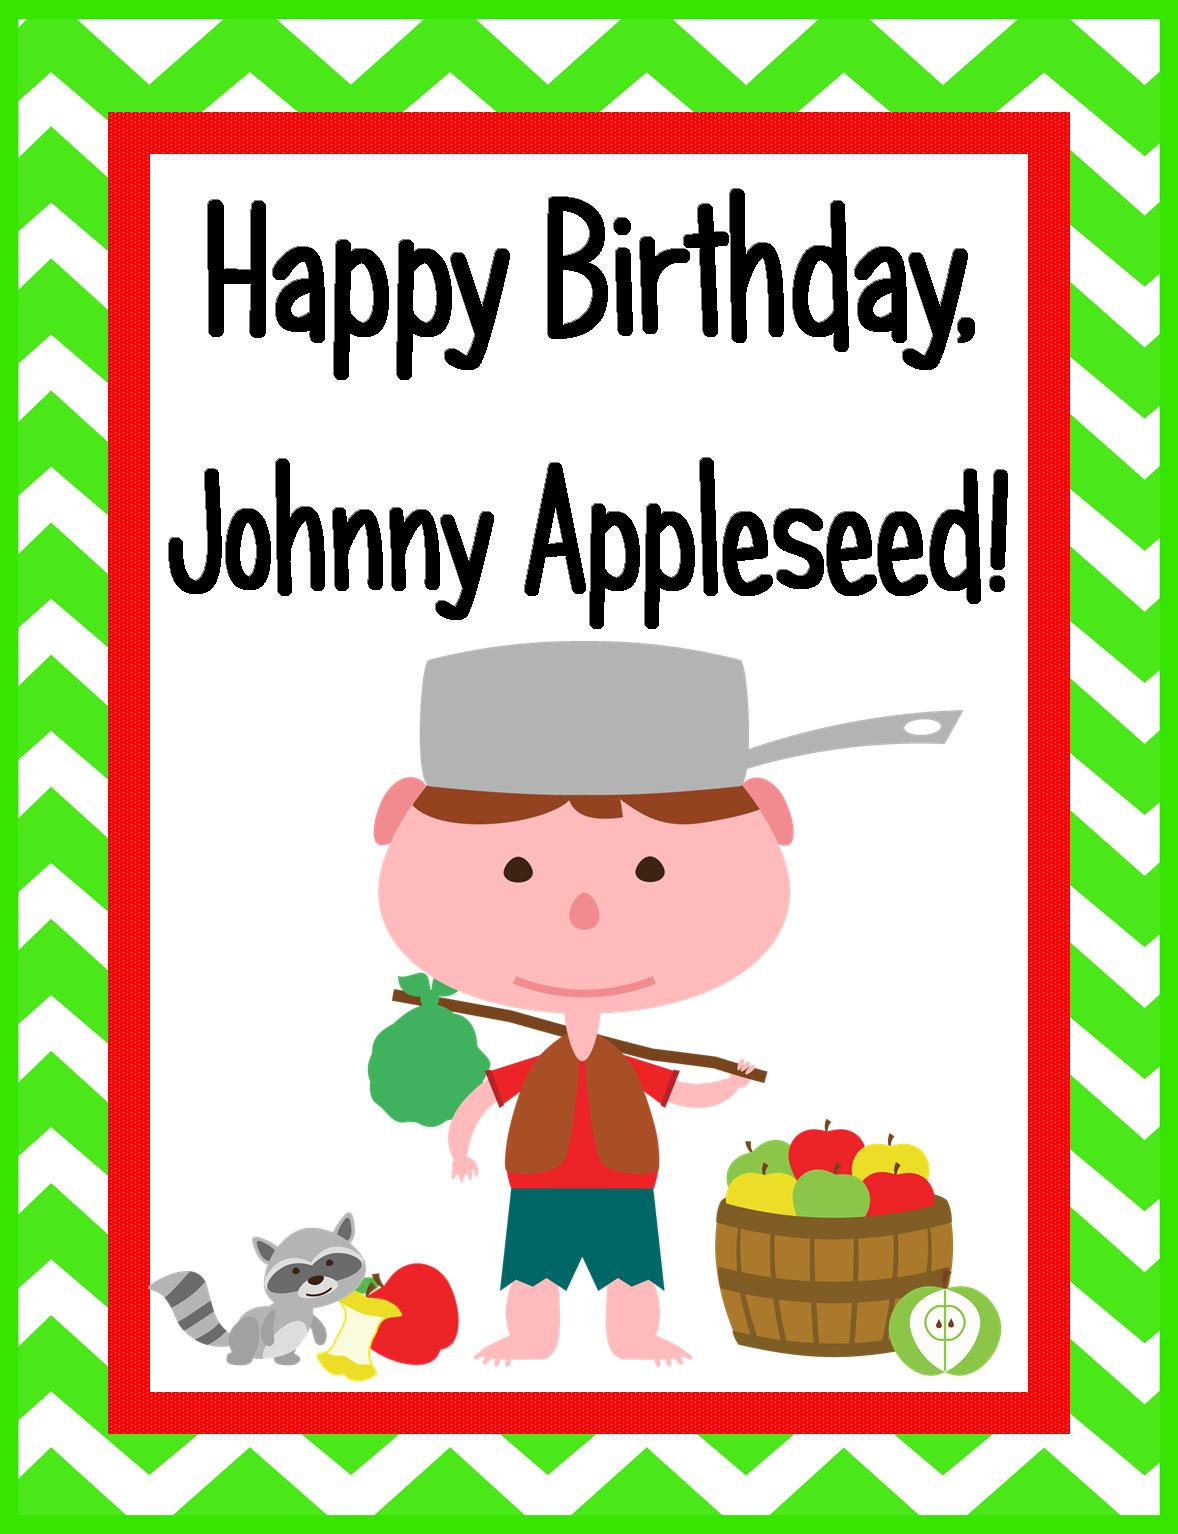 Happy Birthday Johnny Appleseed I So I Have Created A